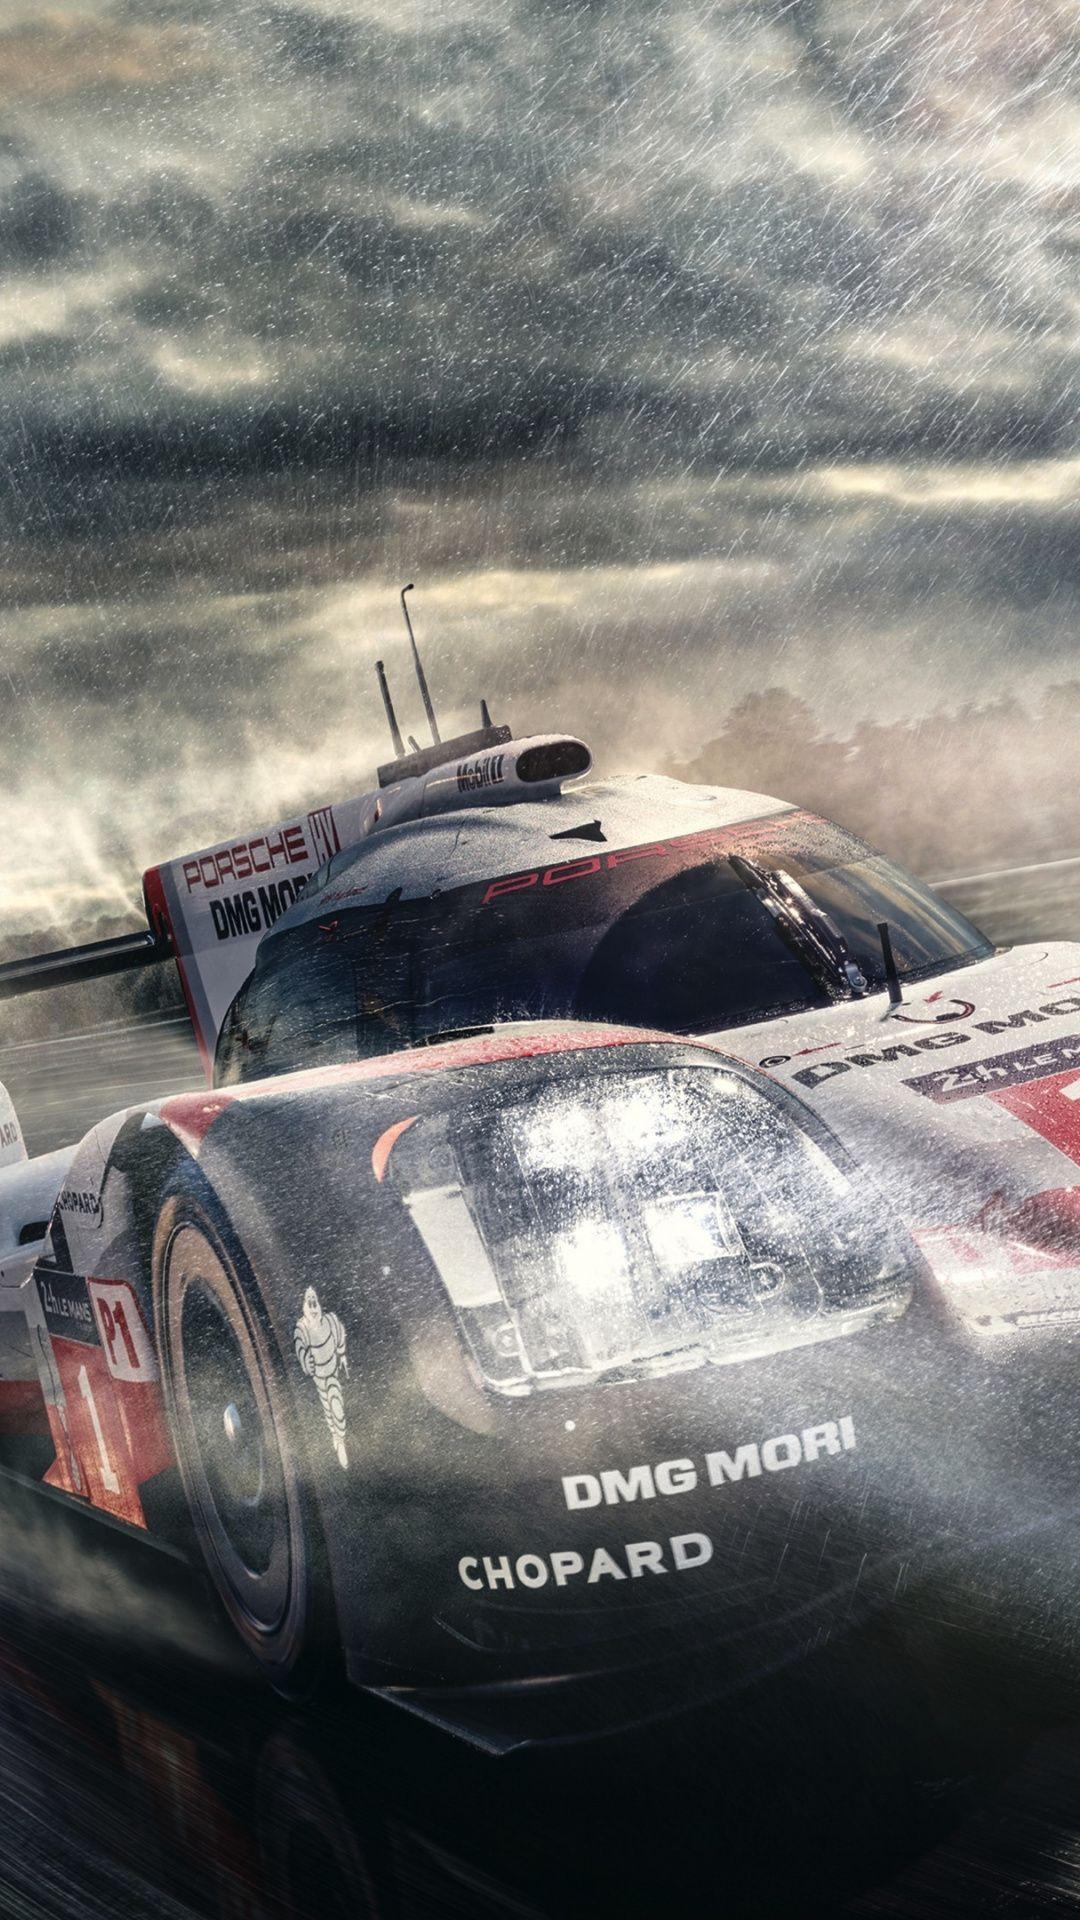 Downaload Porsche 919 hybrid formula one sports car wallpaper 1080x1920